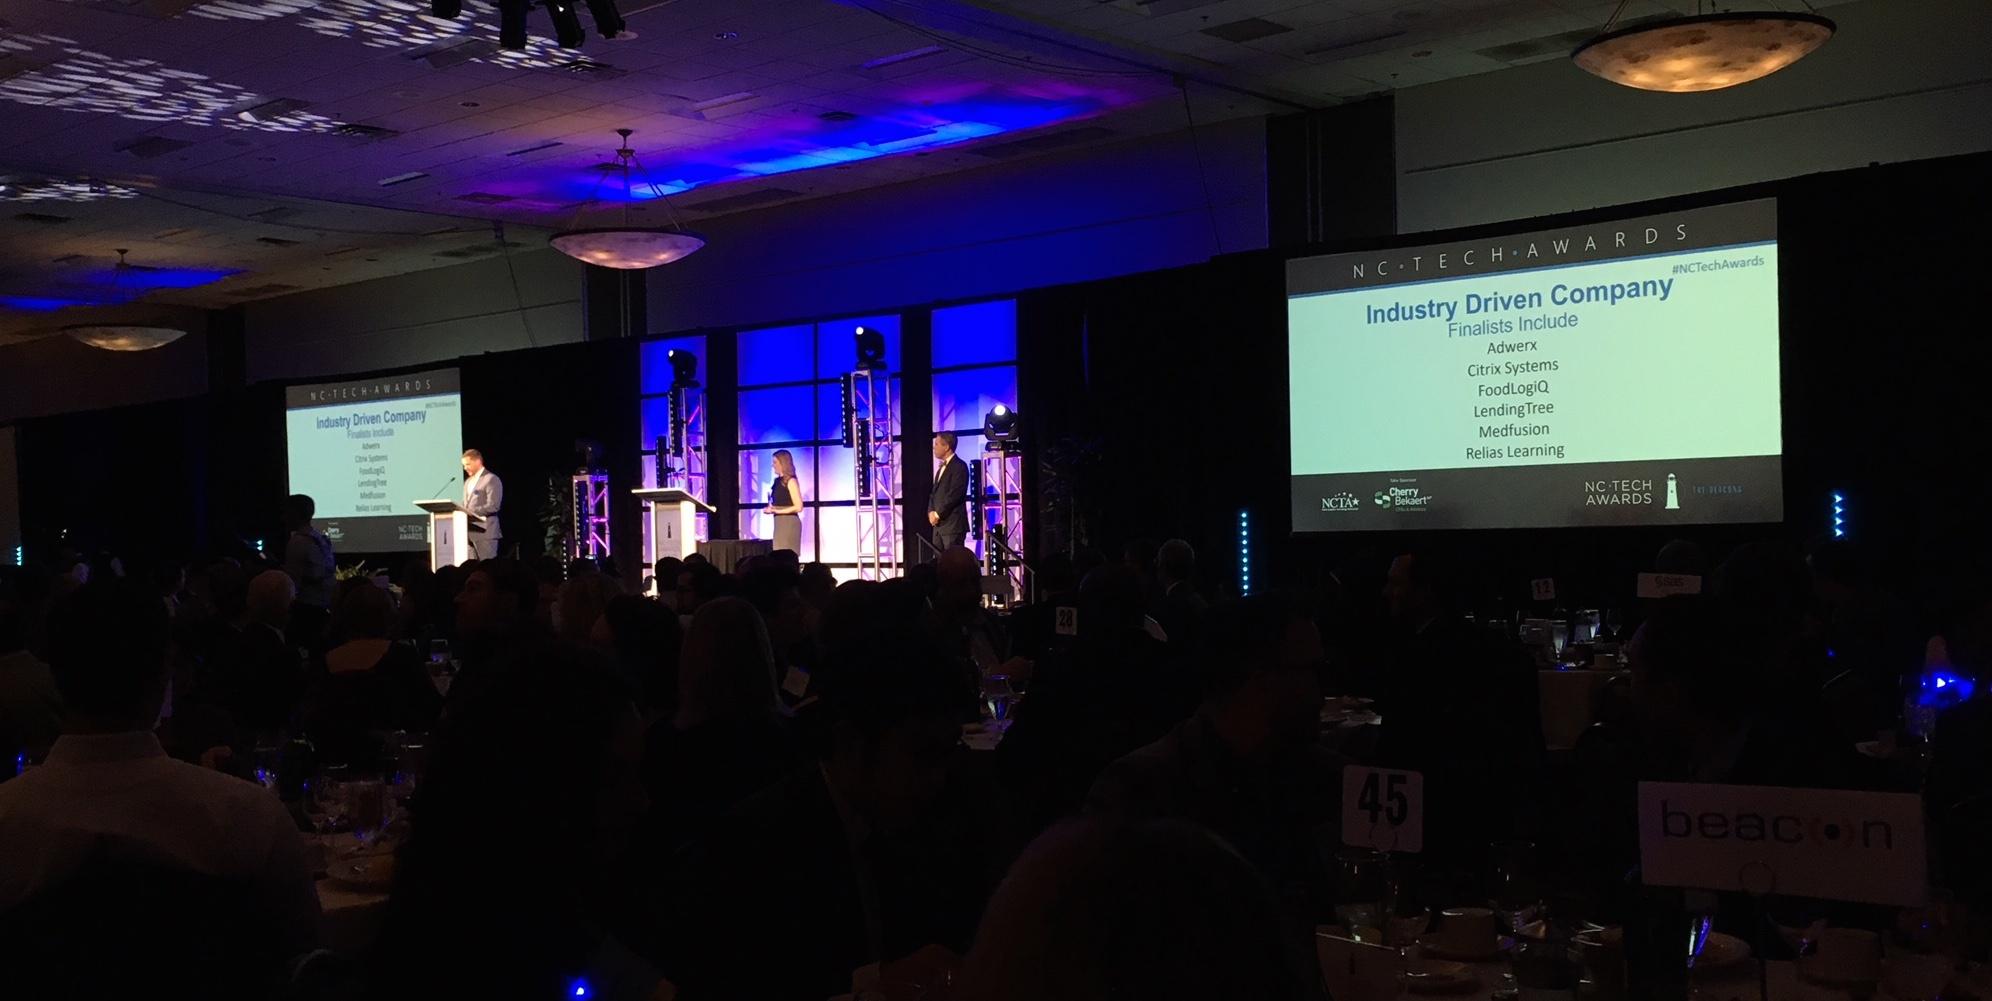 FoodLogiQ Named as a 2017 NC Tech Award Finalist